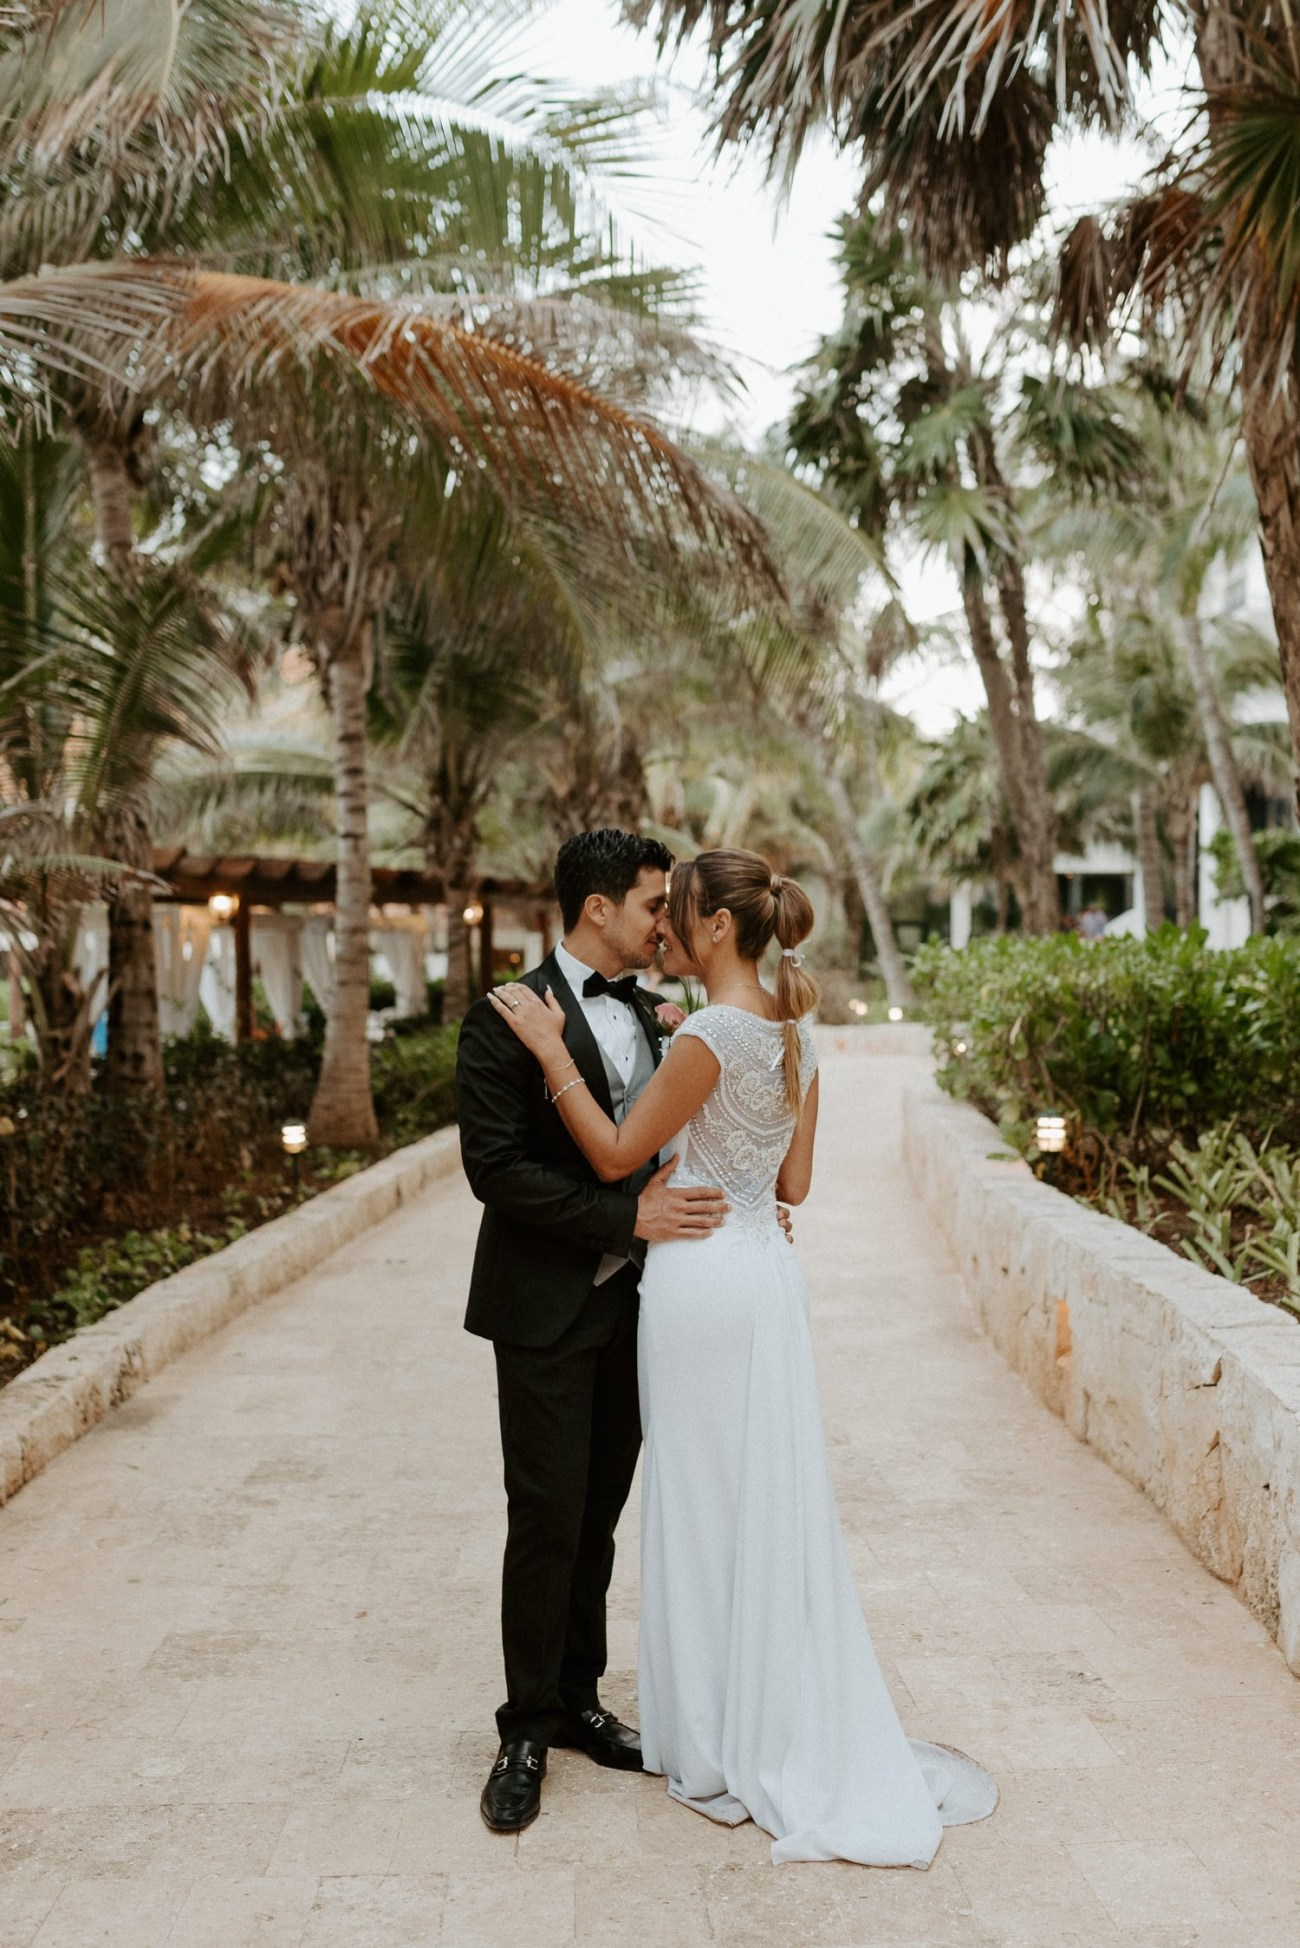 Cancun Destination Wedding Mexico Tulum Wedding Photographer Anais Possamai Photography 055